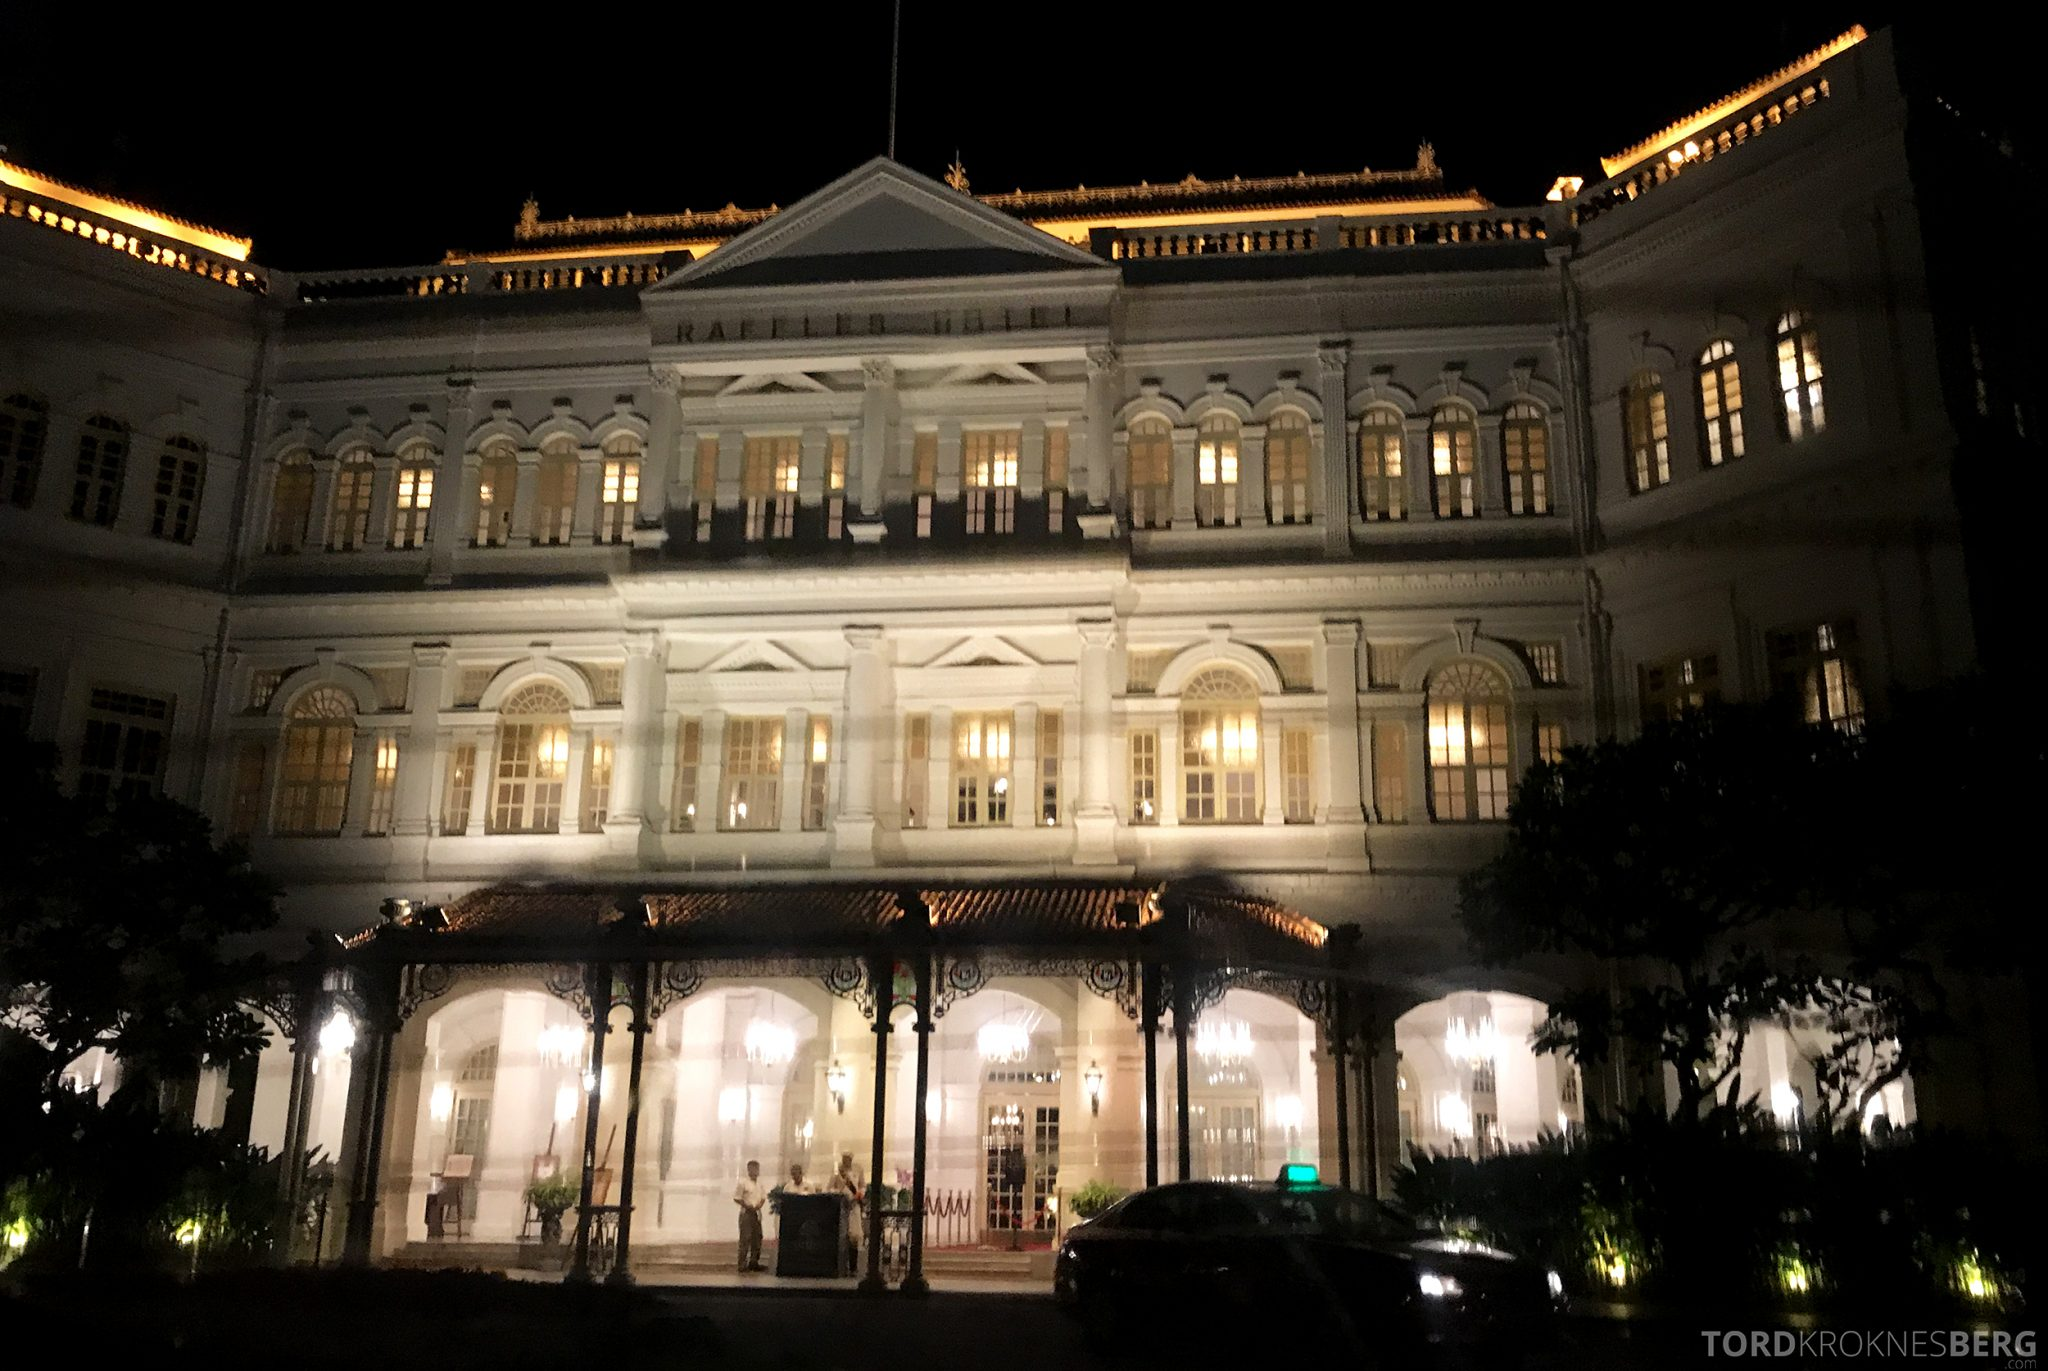 Raffles Hotel Singapore fasade